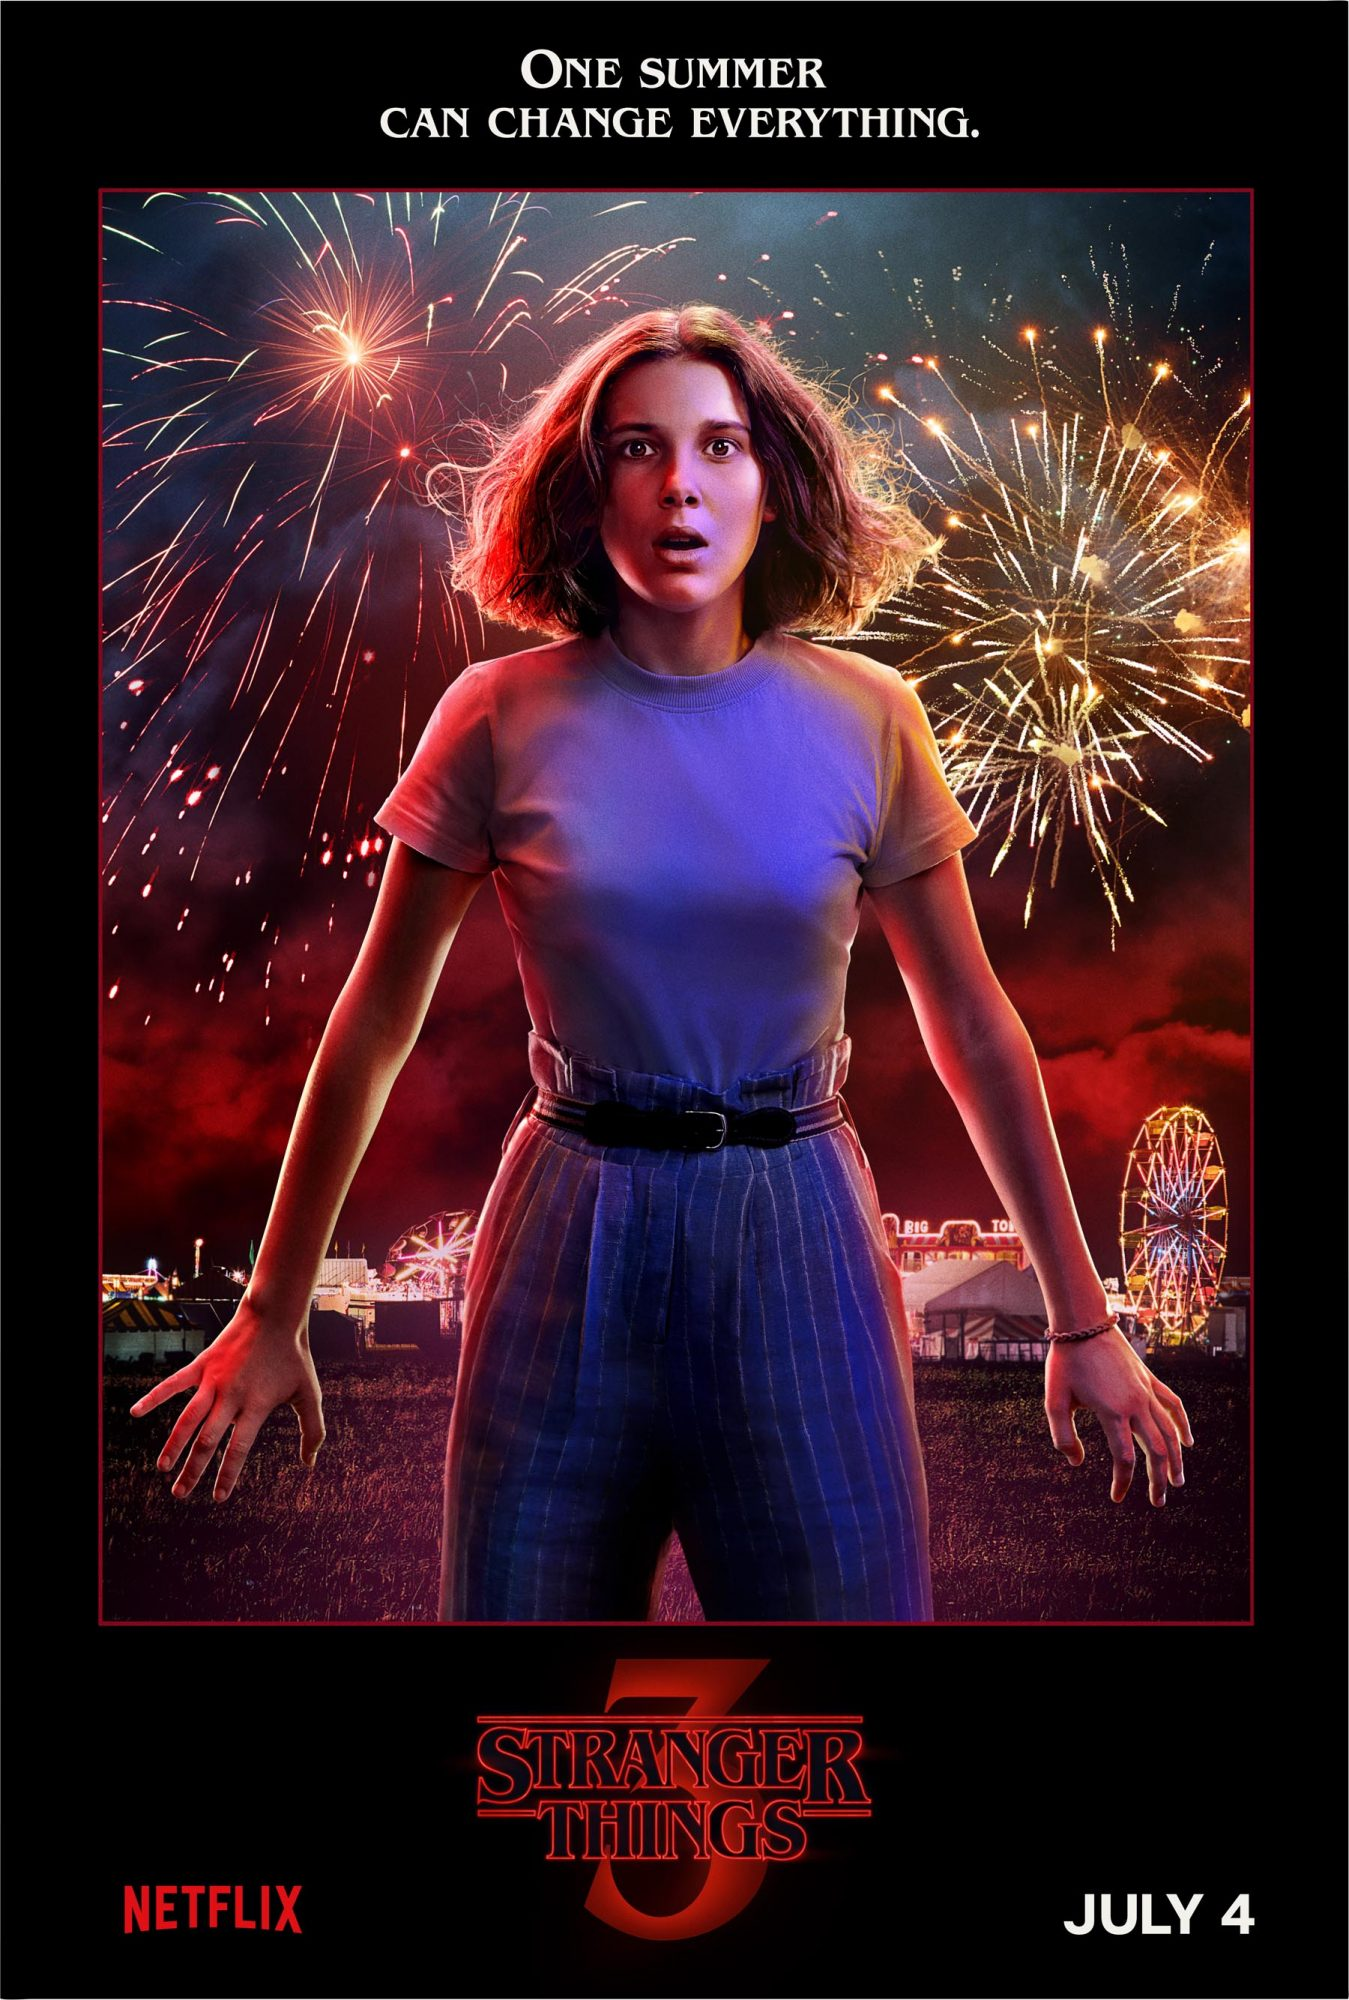 Stranger Things 3Character posterCR: Netflix